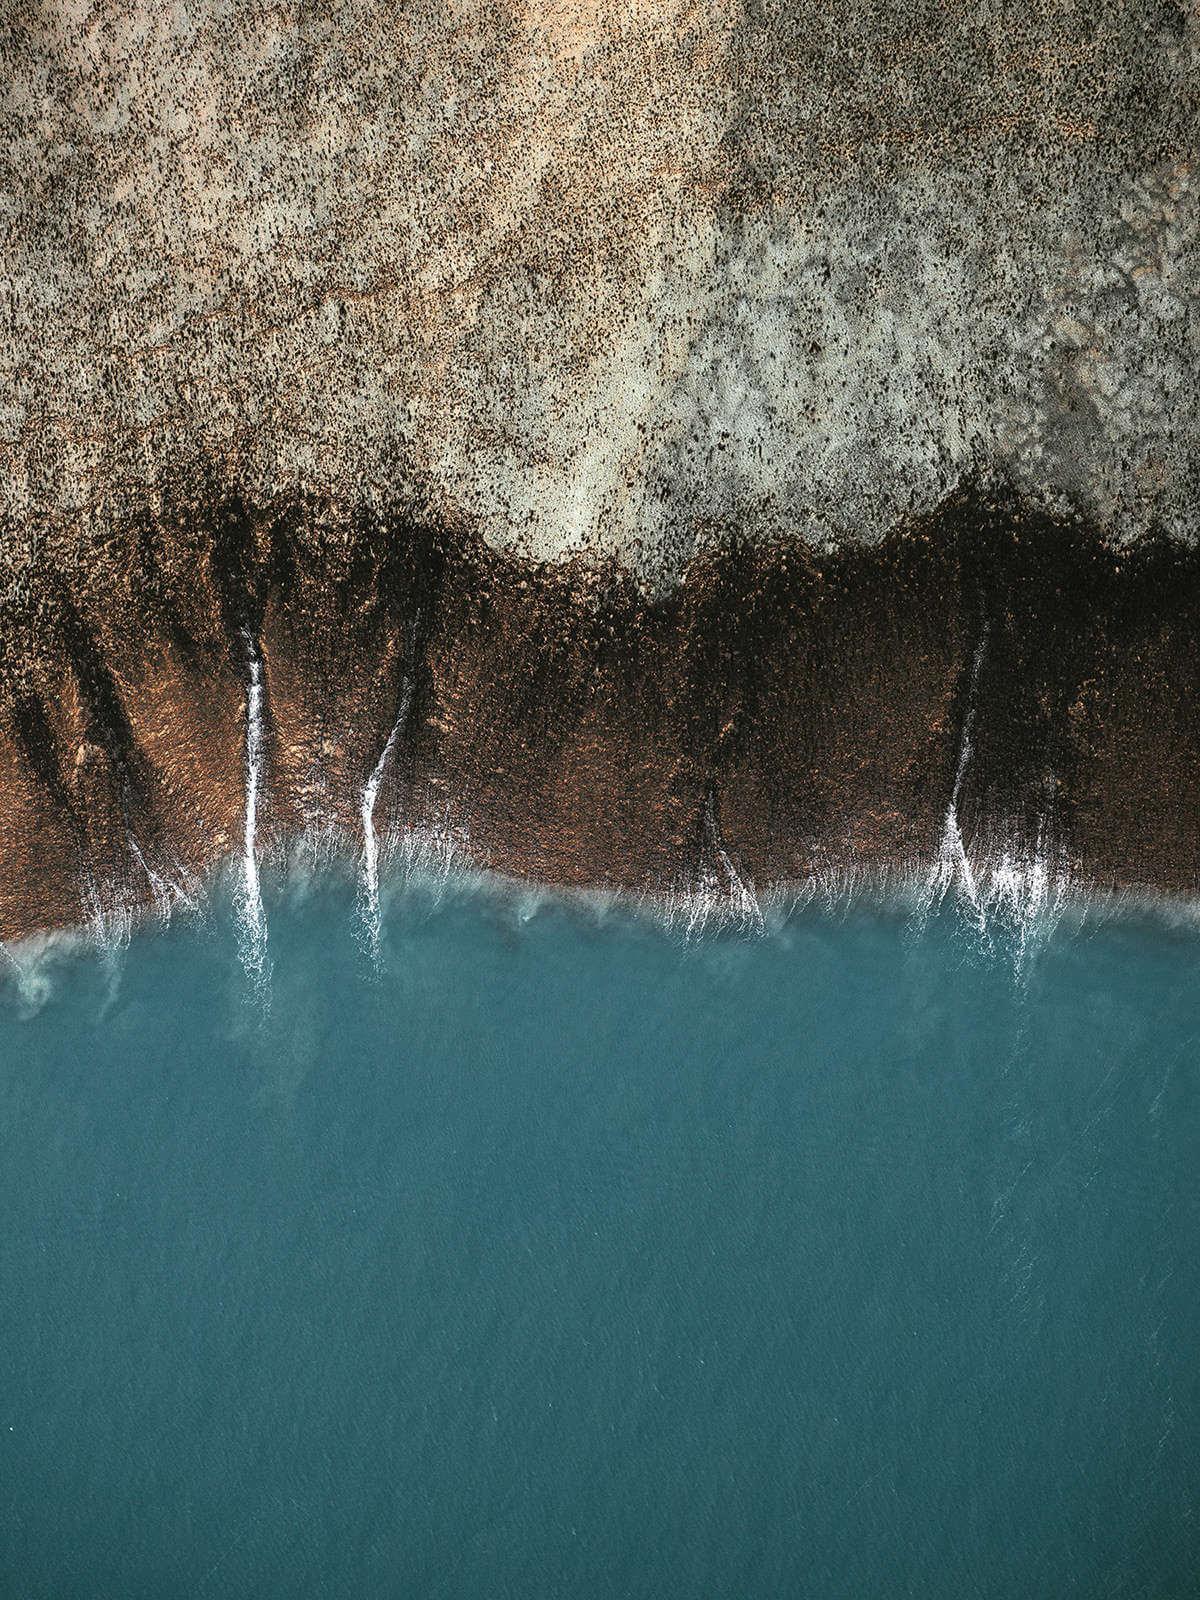 arrecifes Kevin Krautgarner